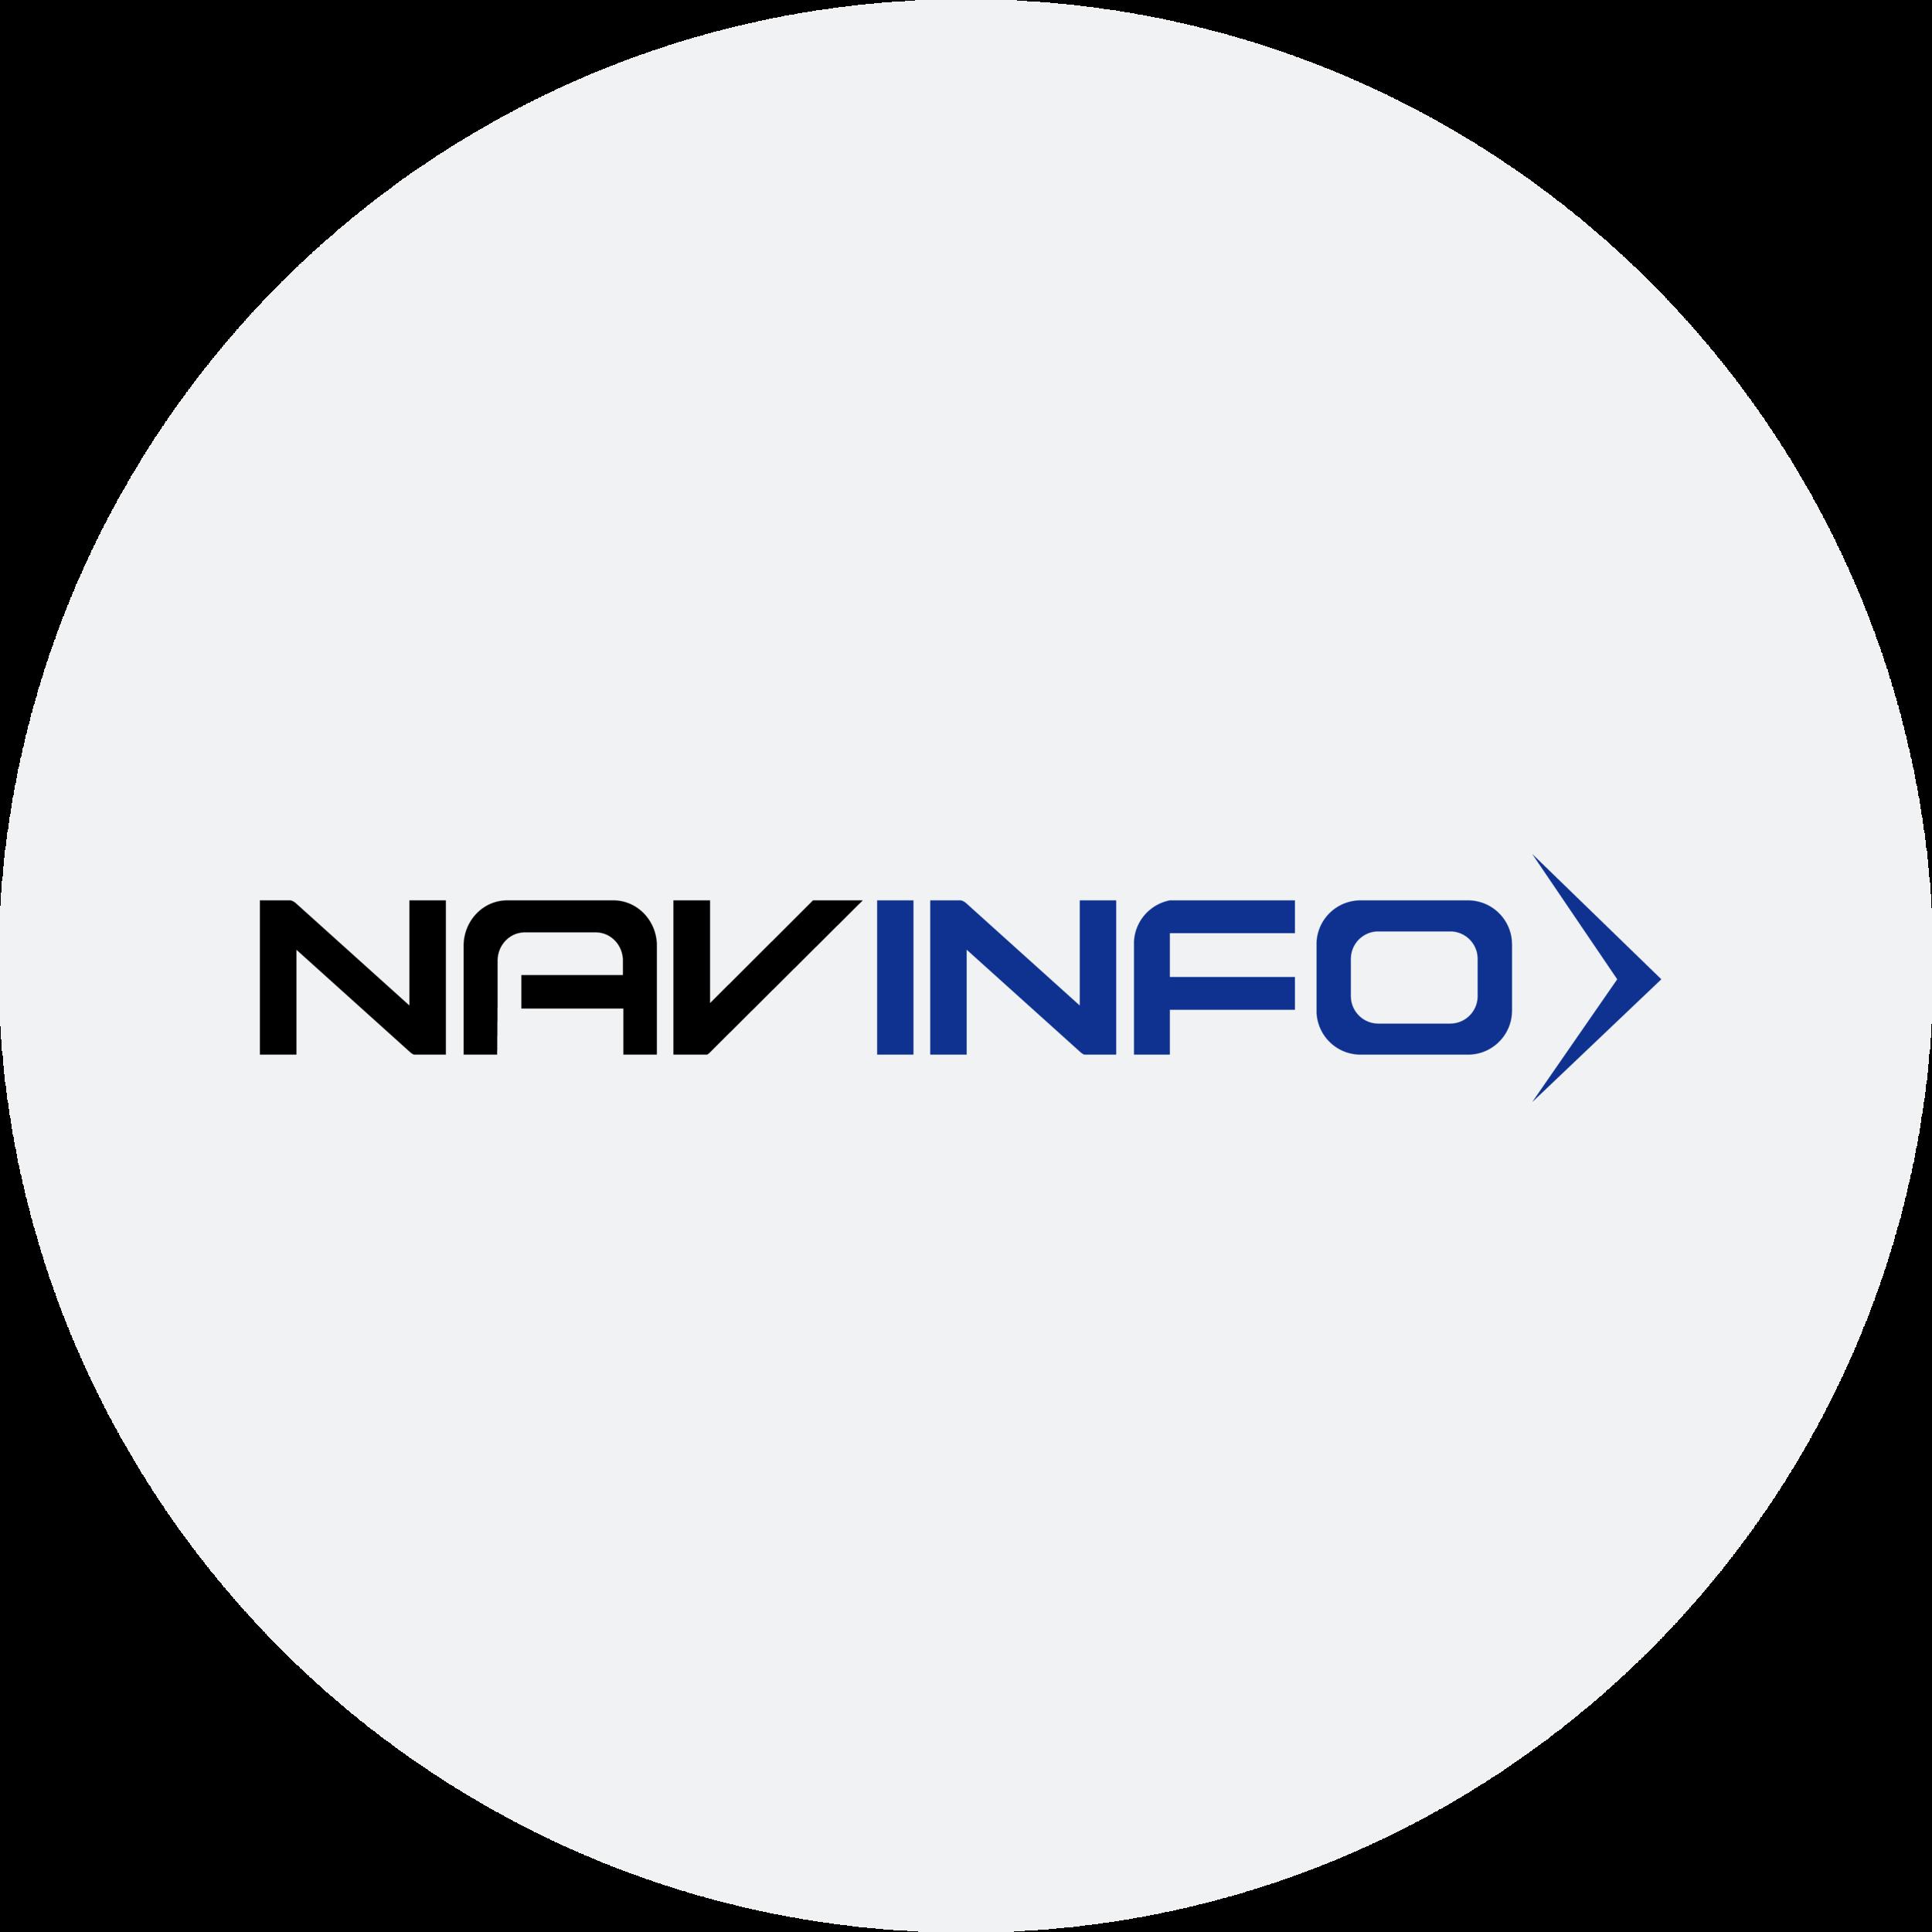 navinfo.png